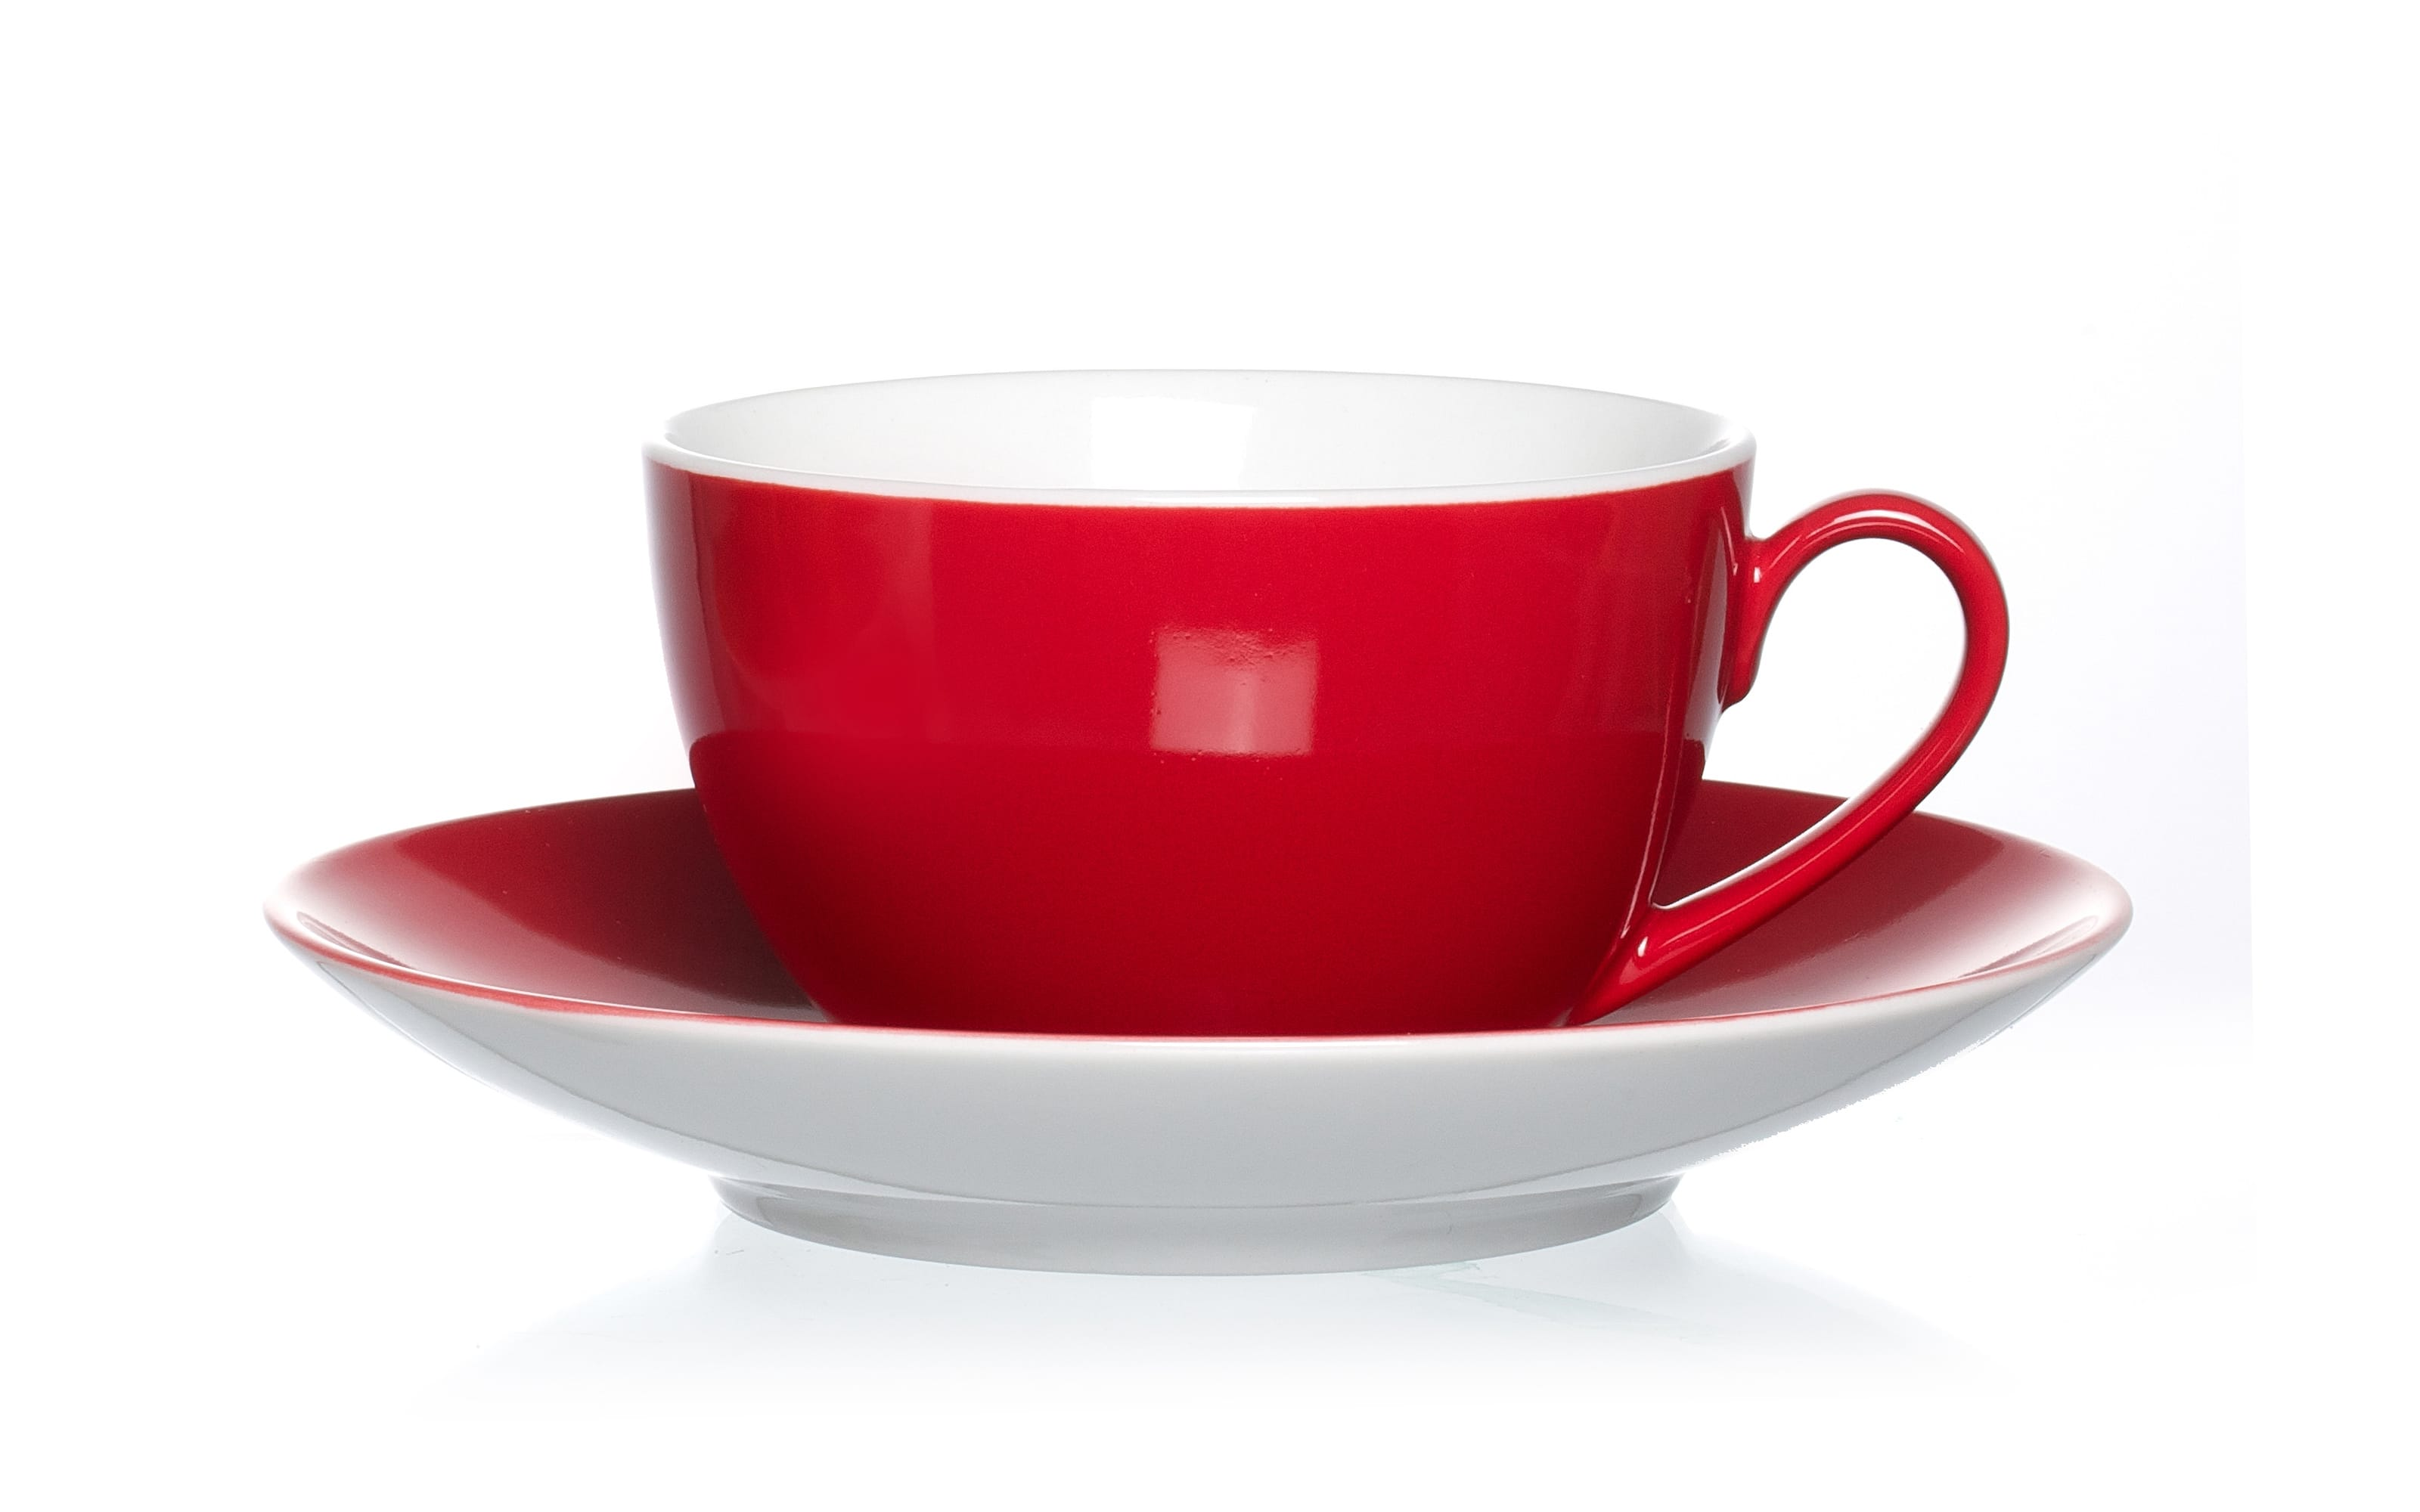 Kaffeetasse Doppio in rot, 200 ml